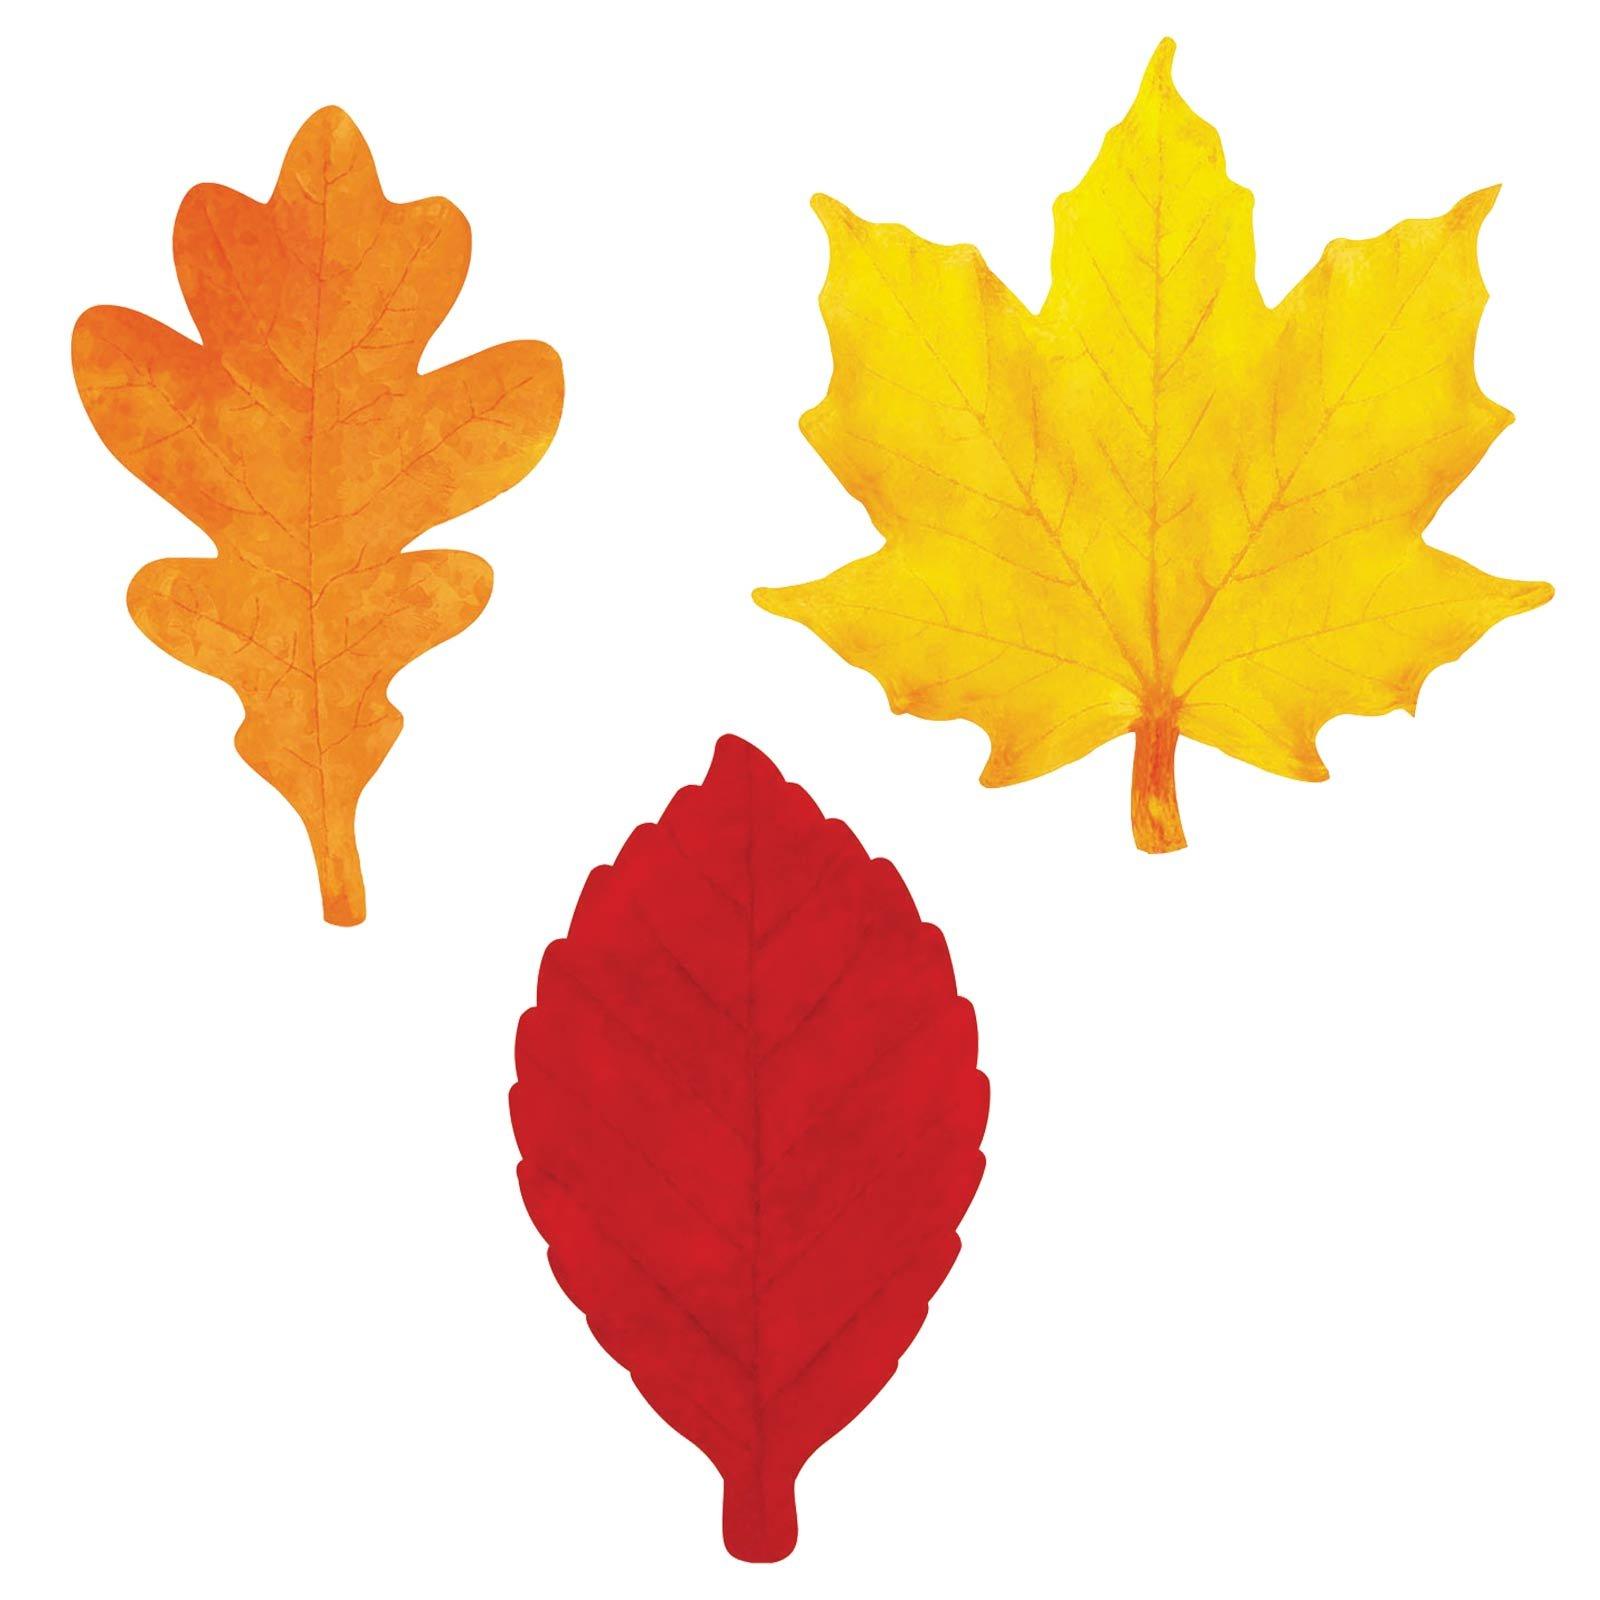 Gargantuan image intended for fall leaves printable